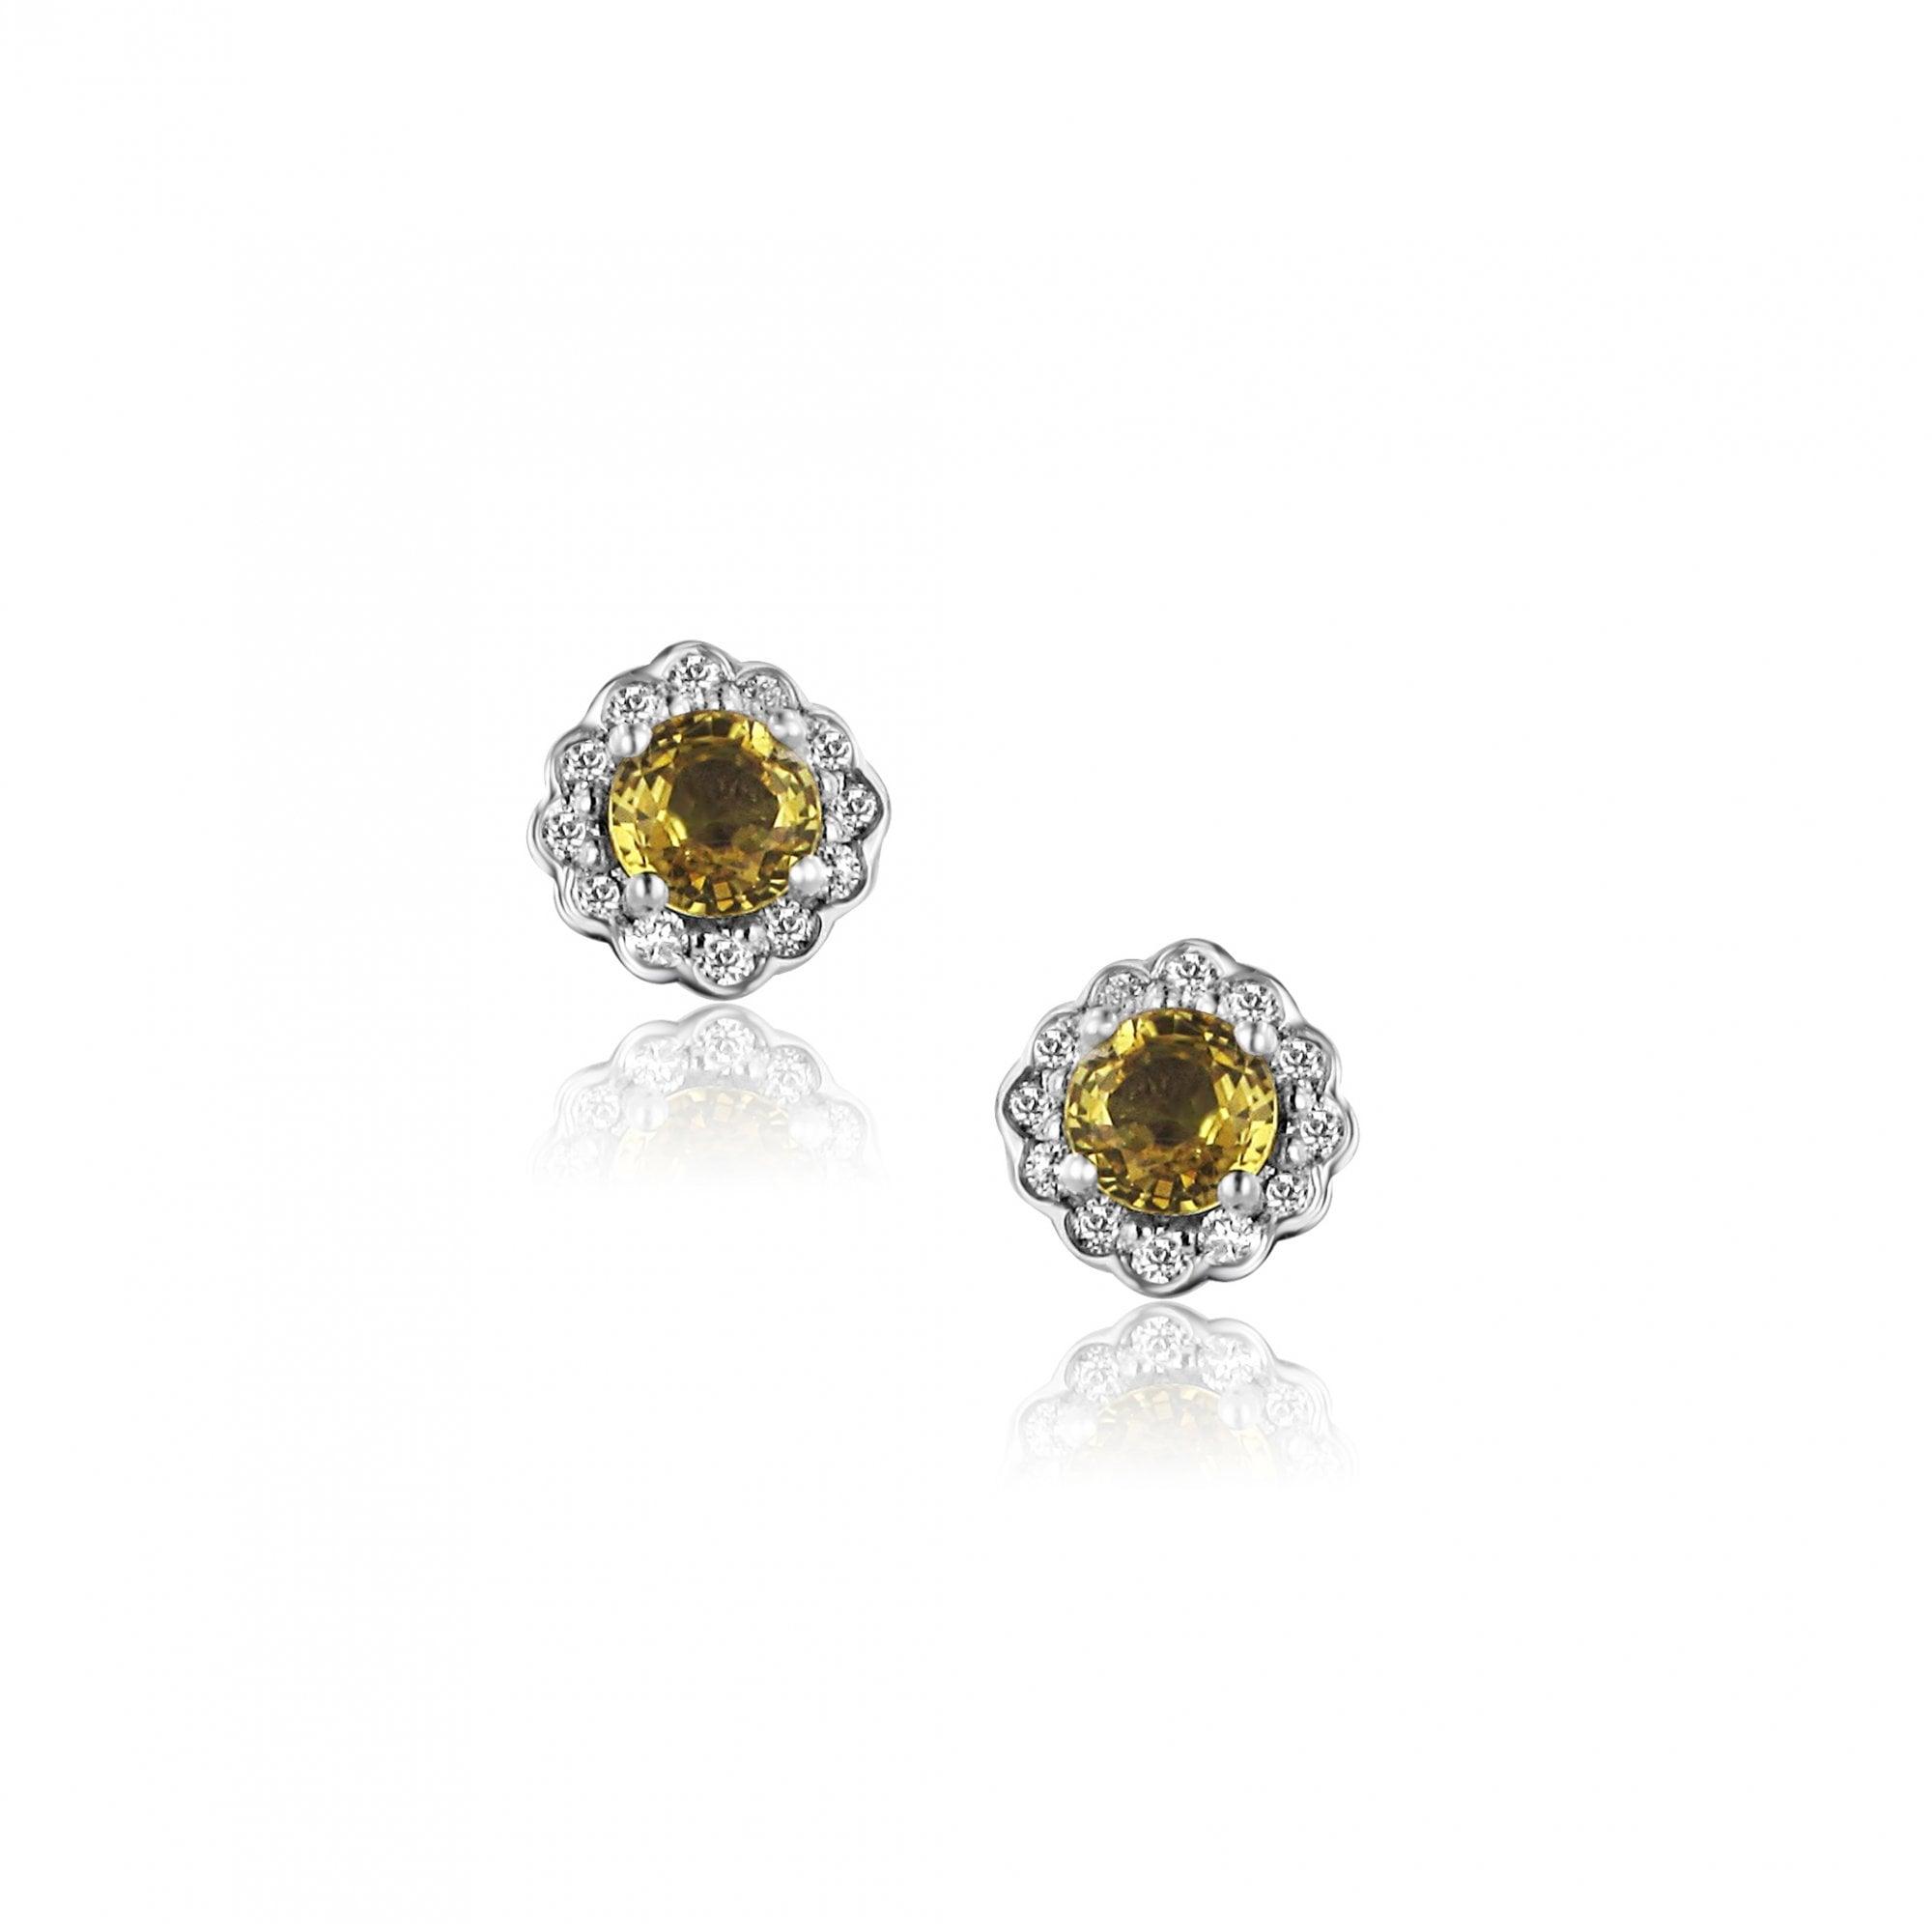 b2bc0e633 Avanti 18ct White Gold Yellow Sapphire and Diamond Halo Stud ...